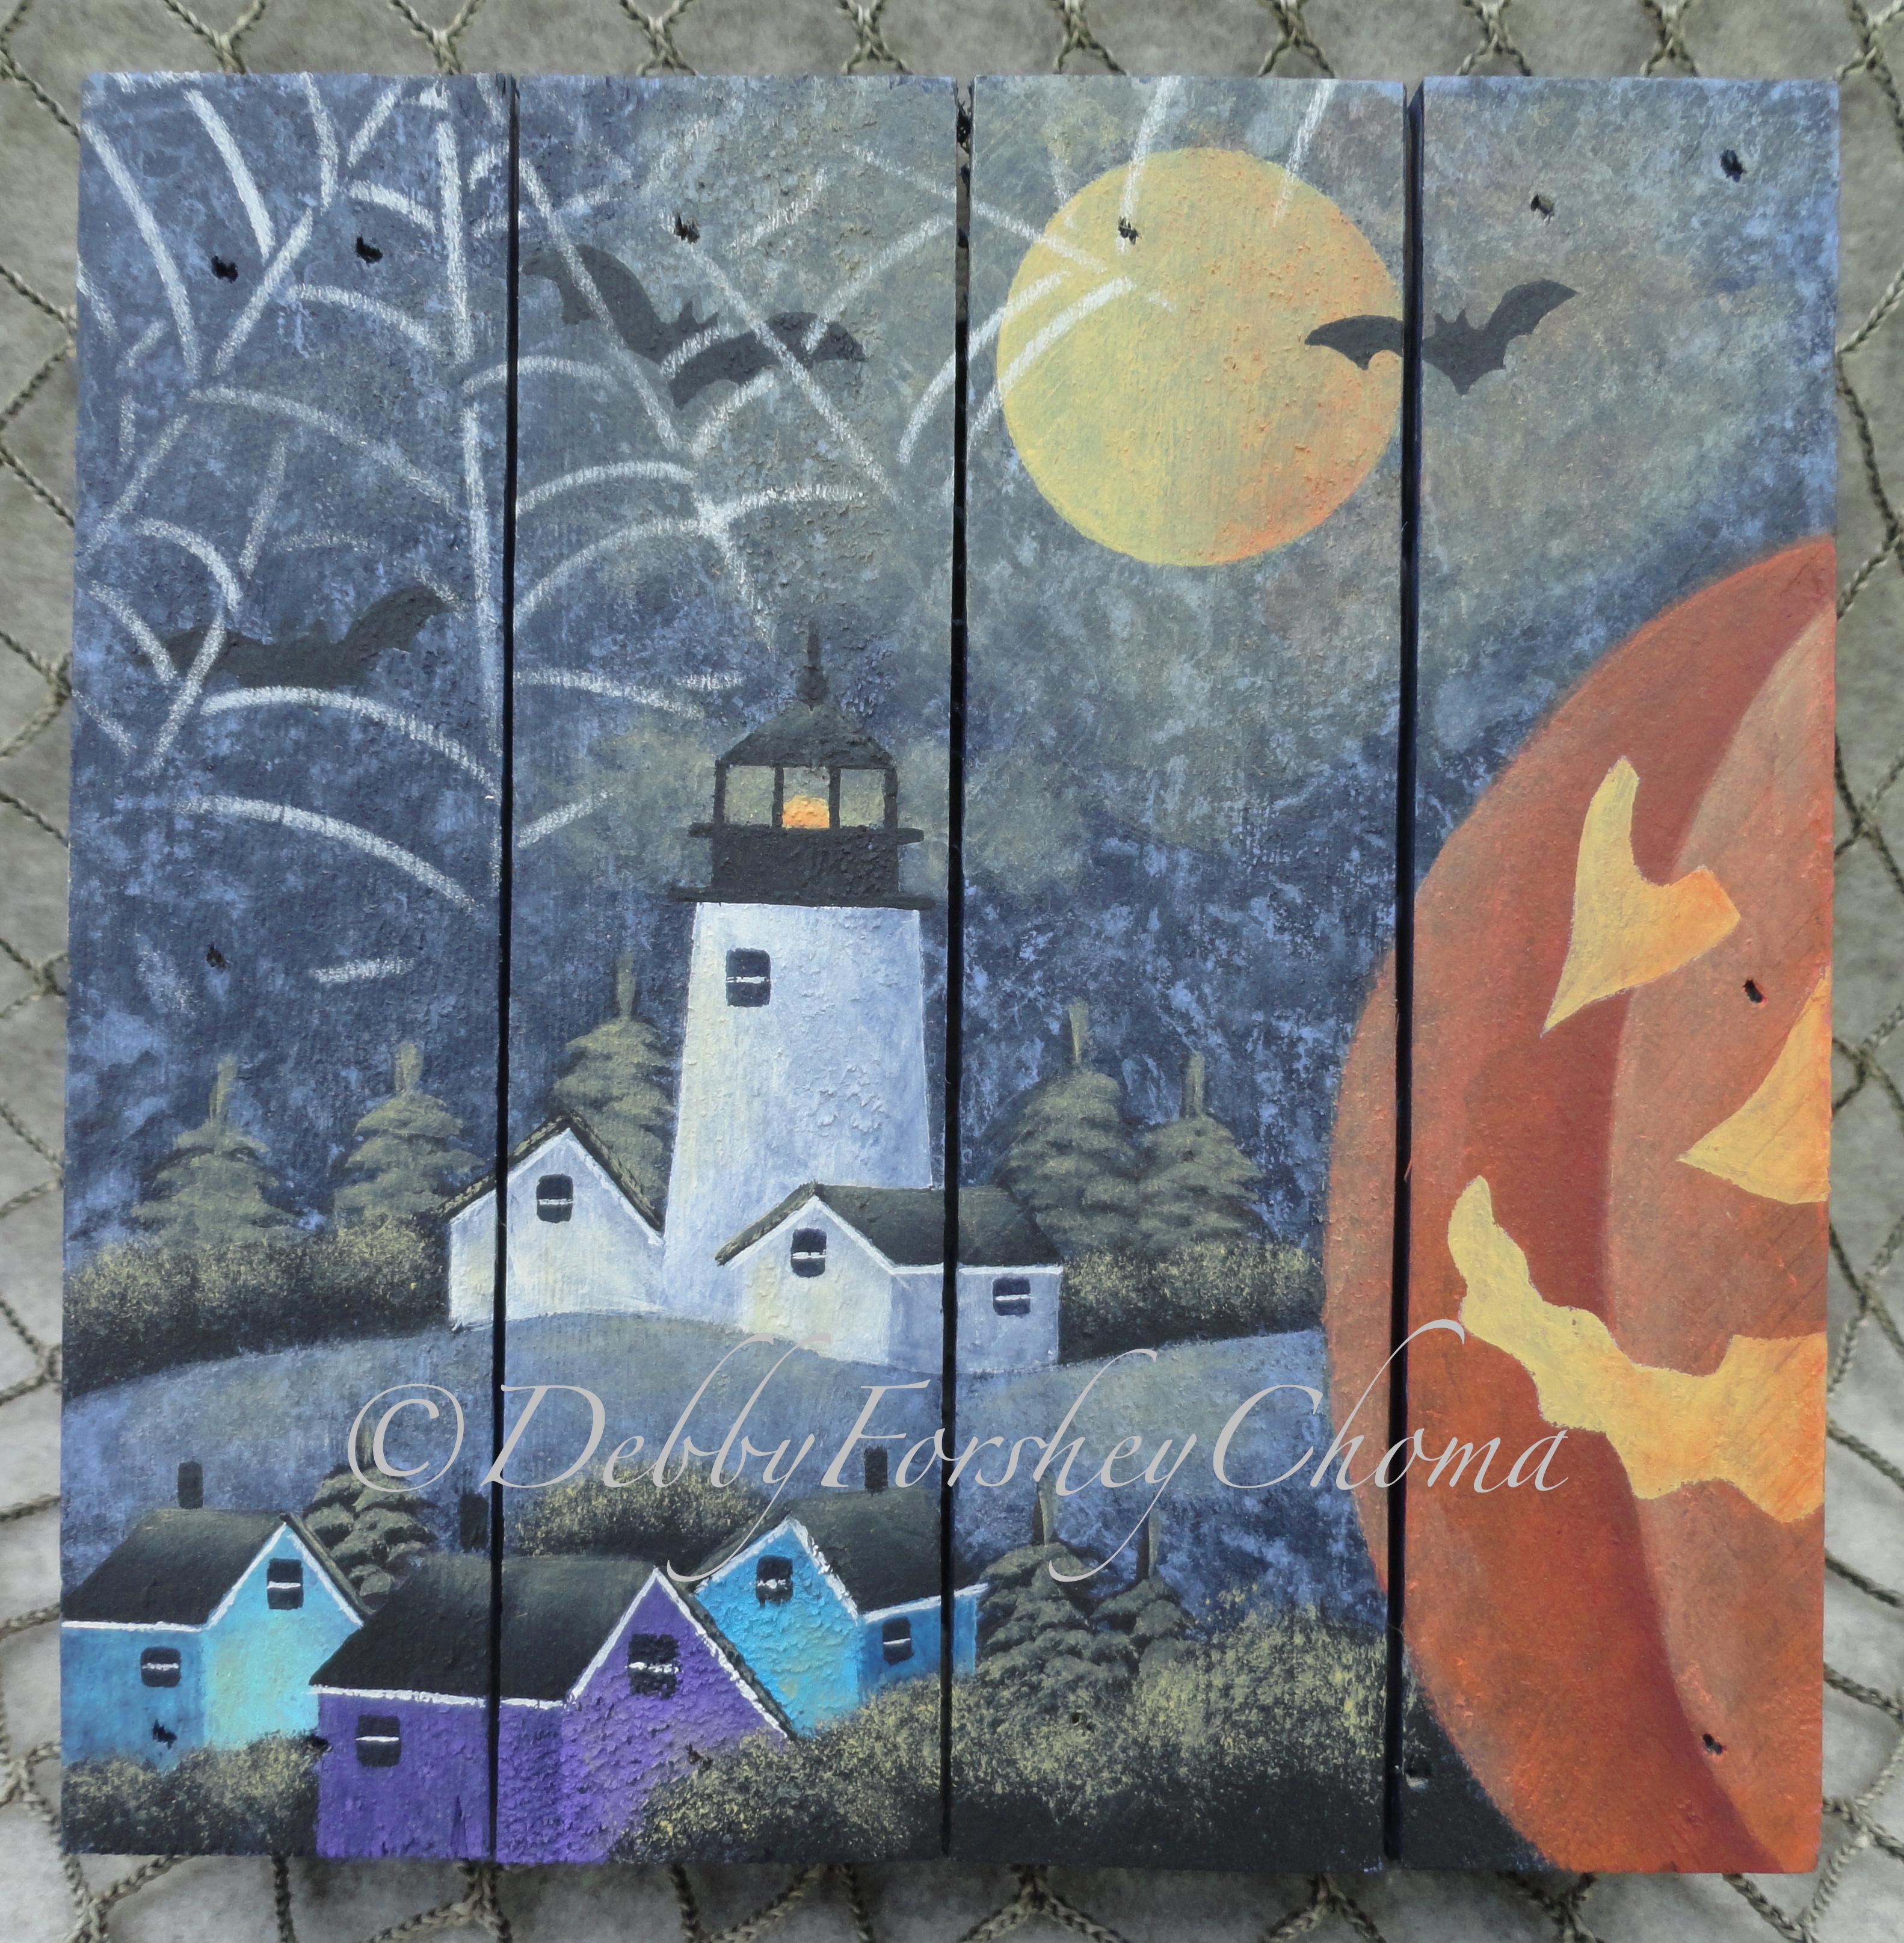 Halloween Glow - E-Packet - Debby Forshey-Choma